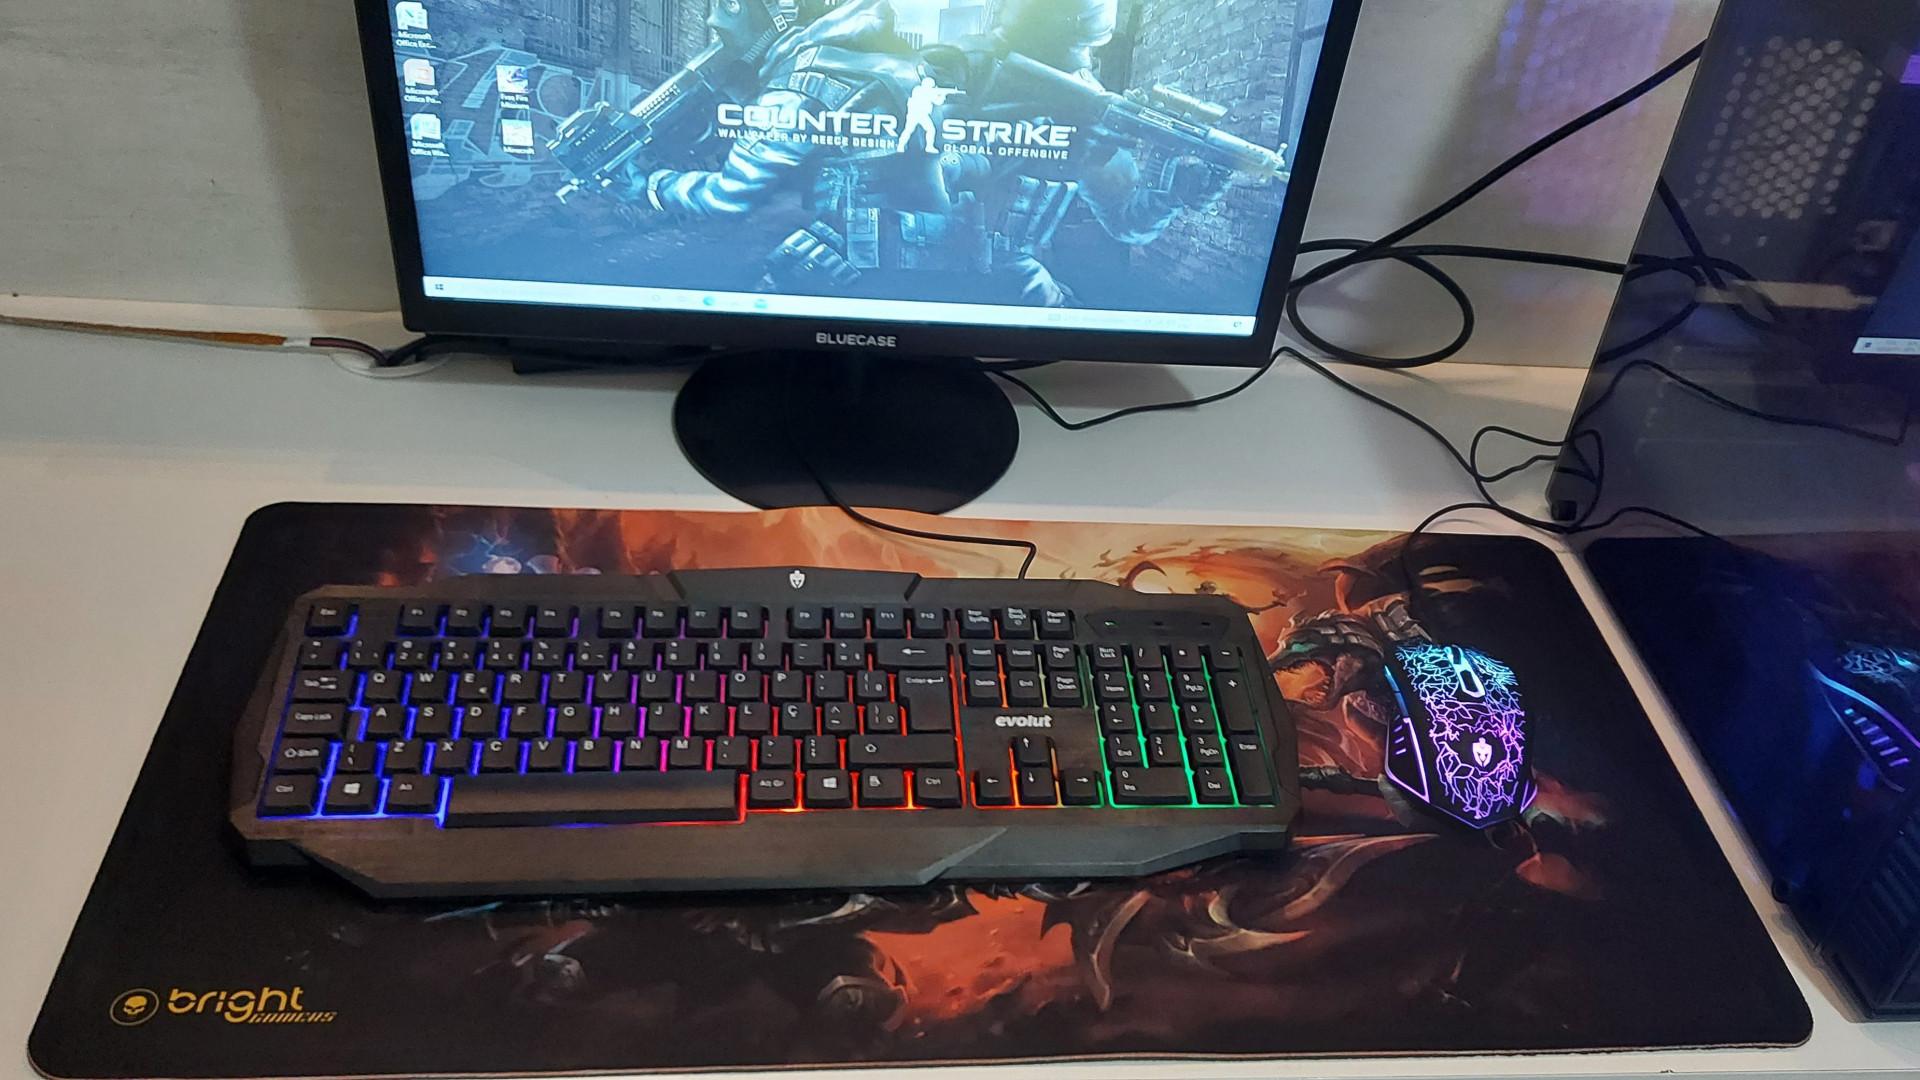 Foto 2 do produto Mouse pad game gigante